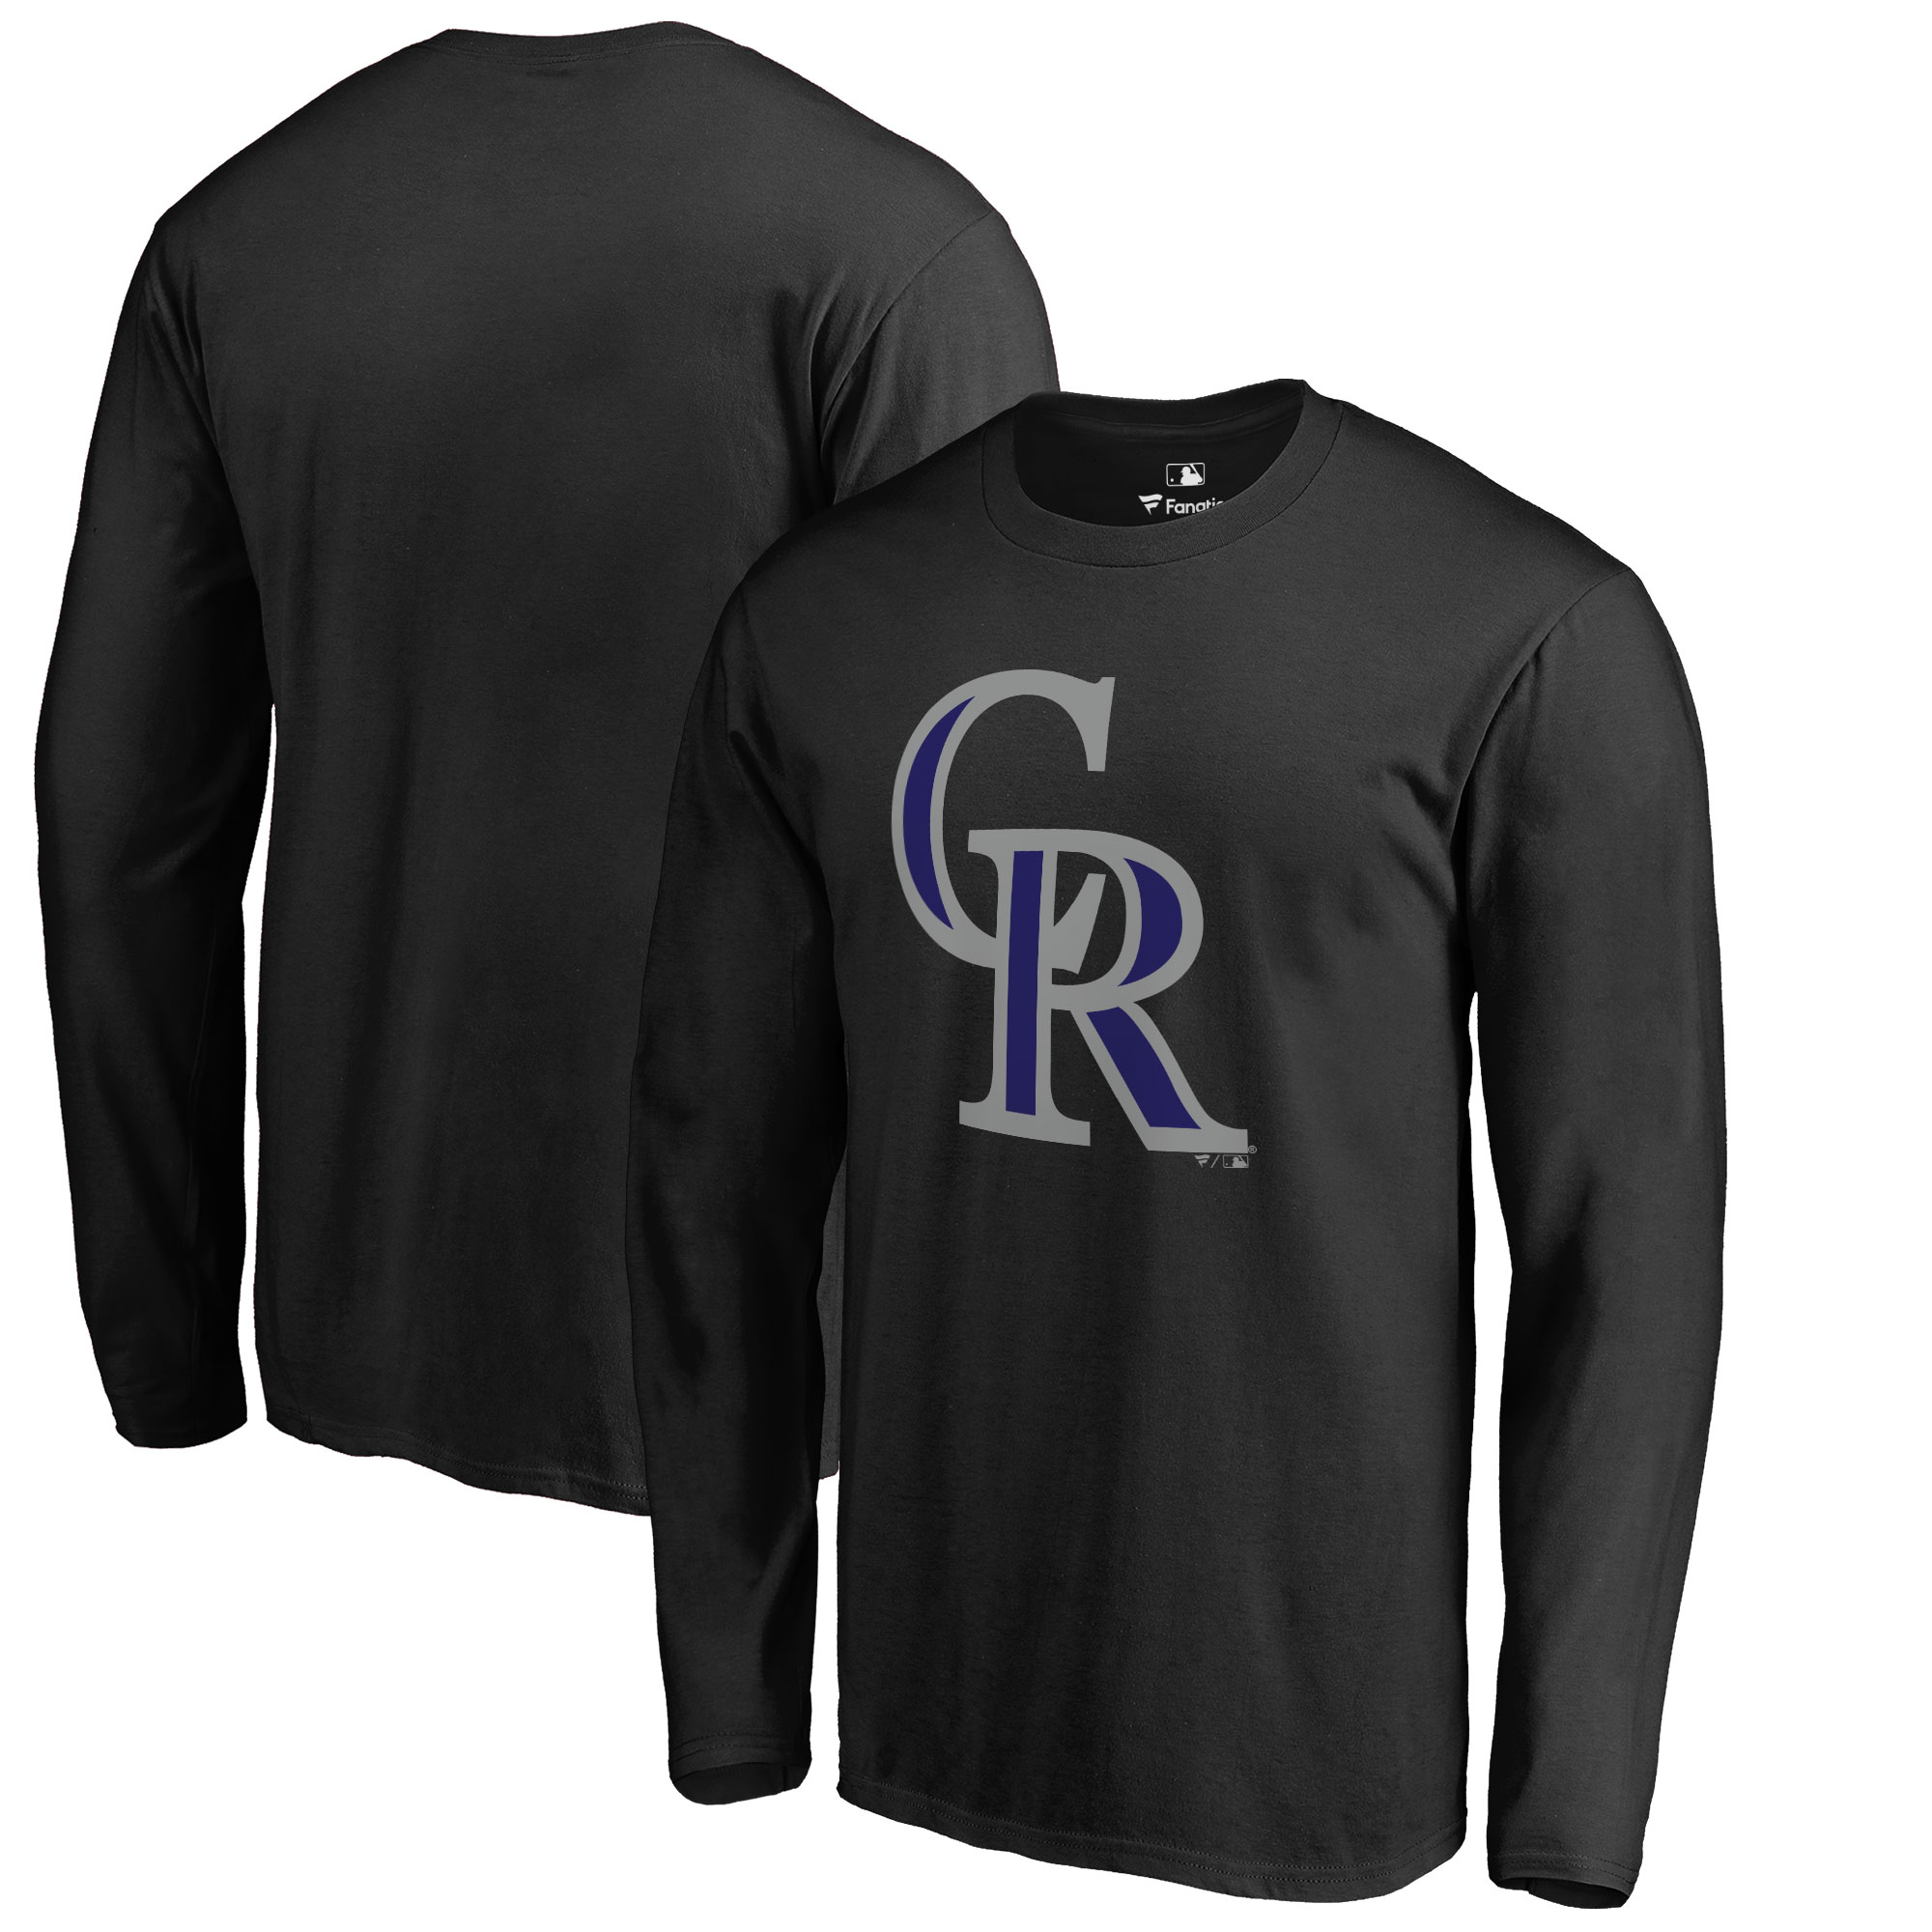 Colorado Rockies Big & Tall Primary Team Logo Long Sleeve T-Shirt - Black